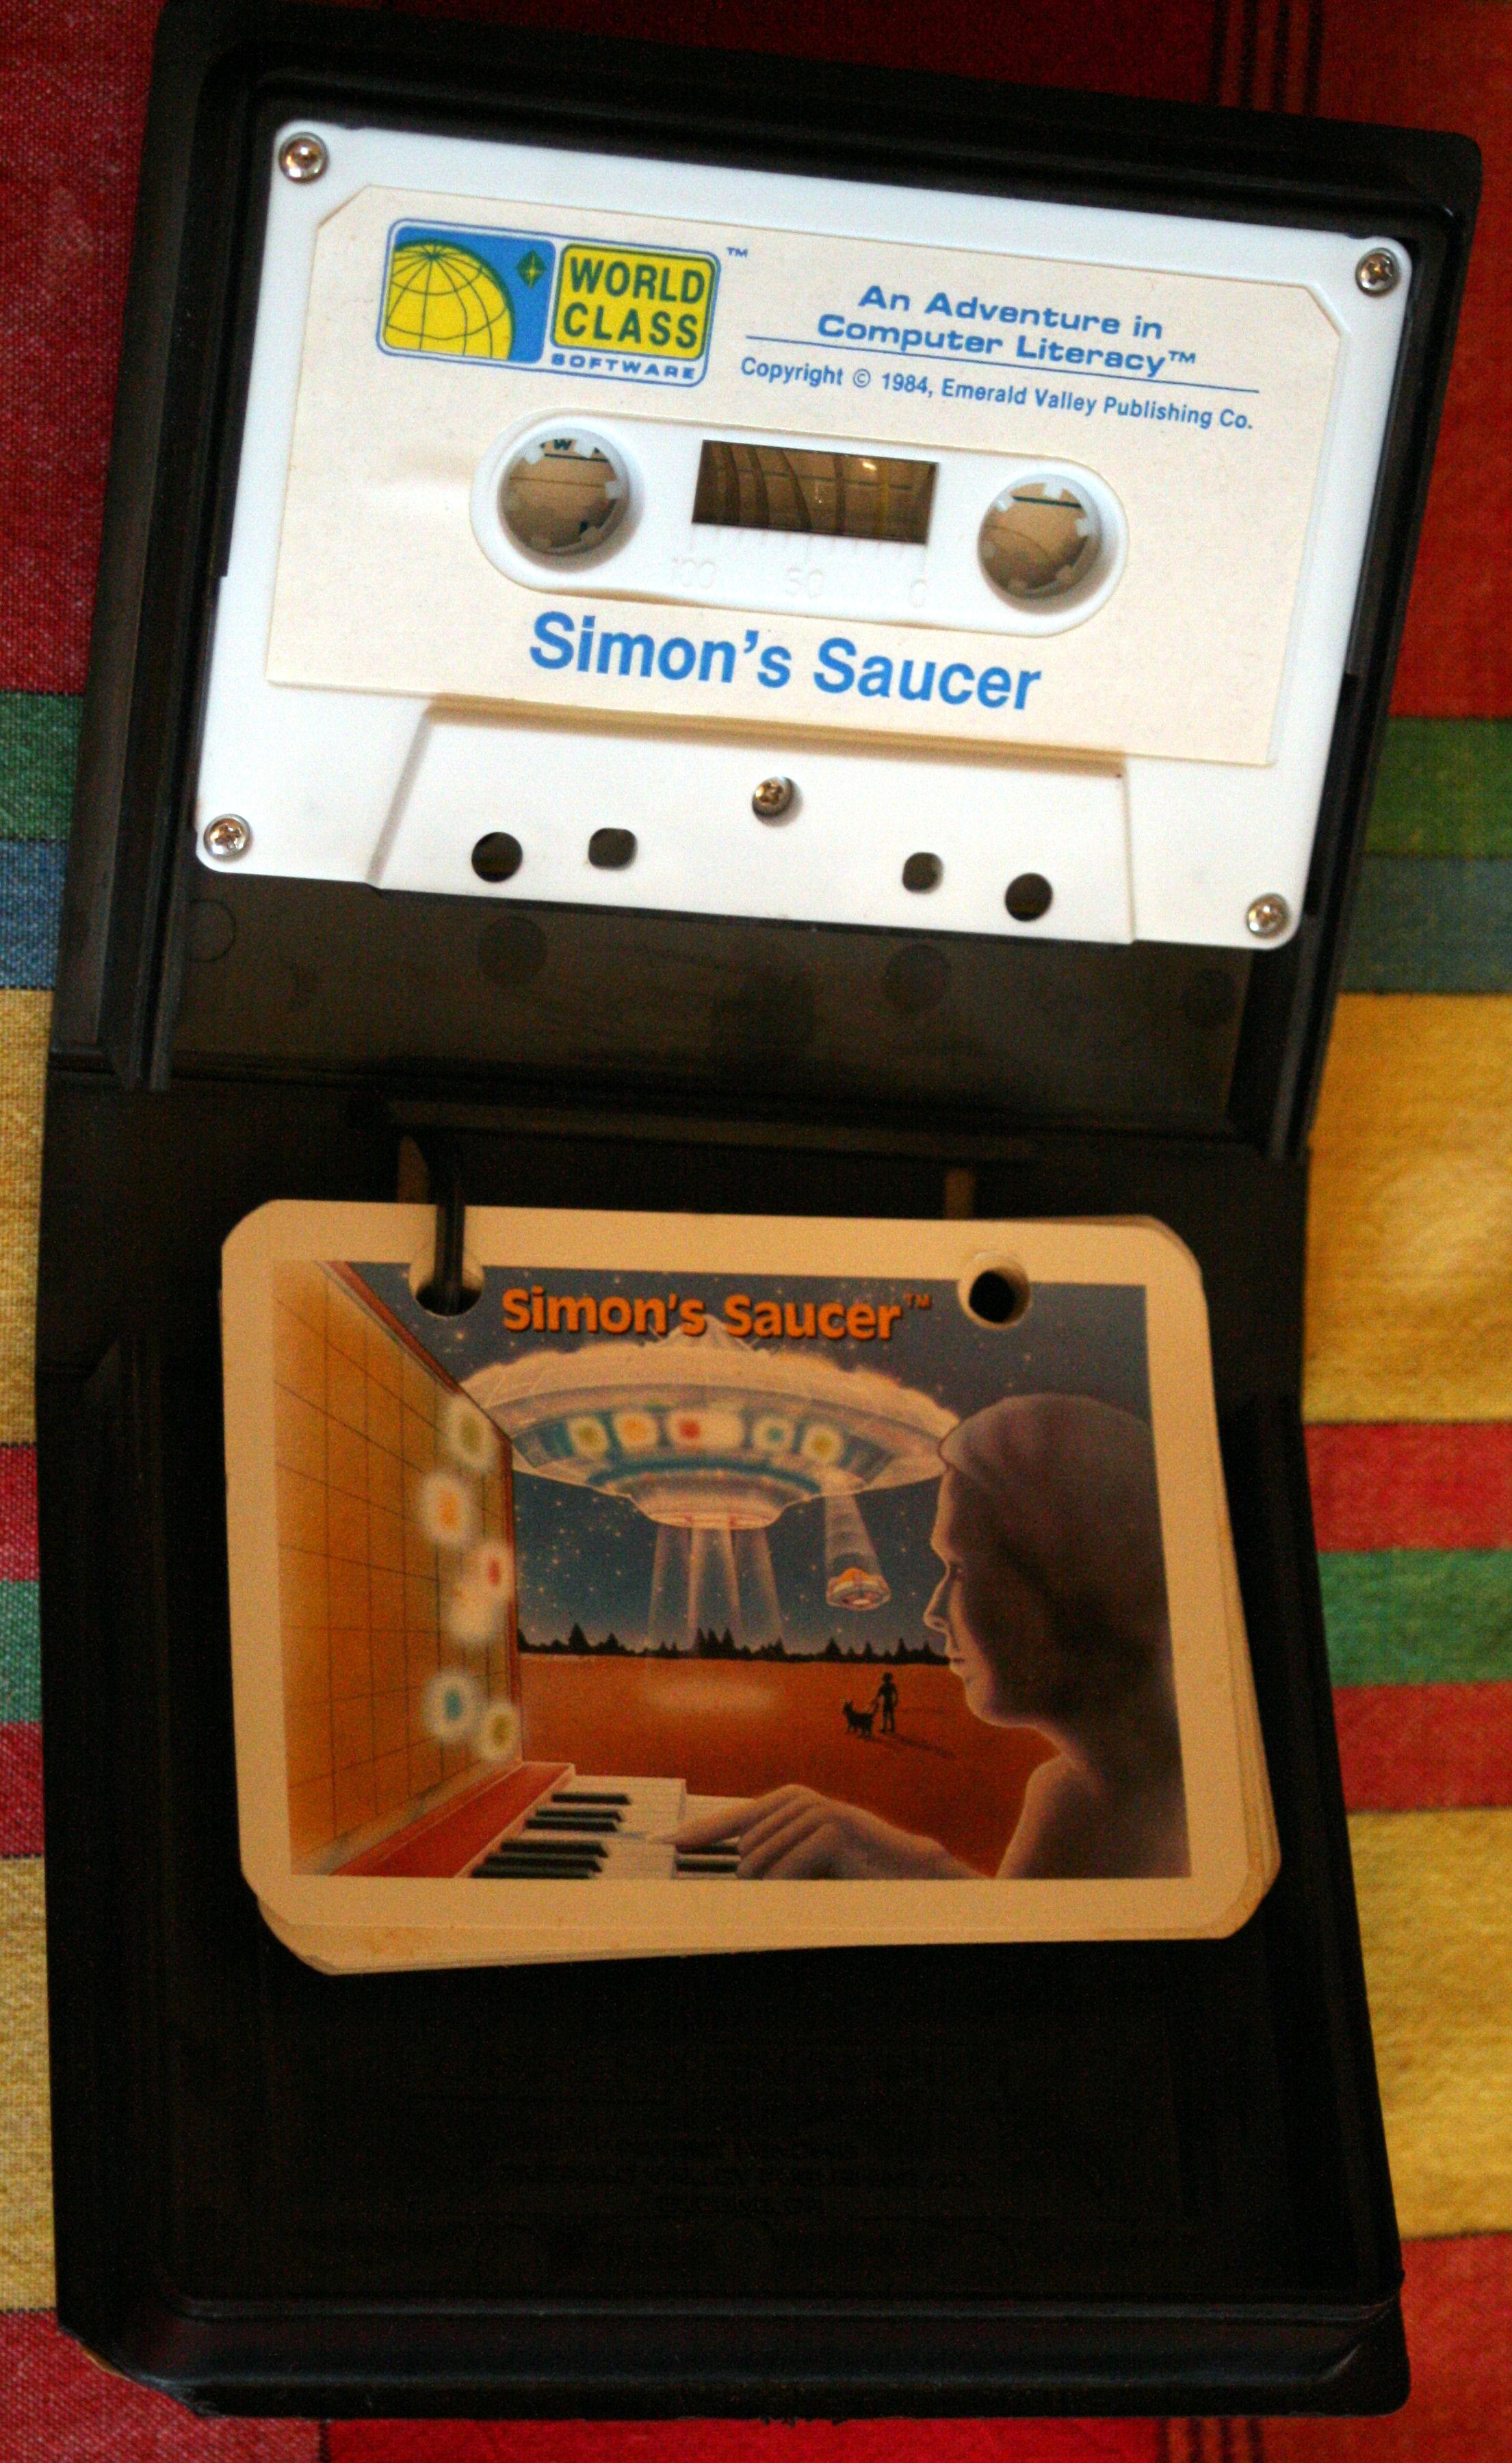 Simon's Saucer2